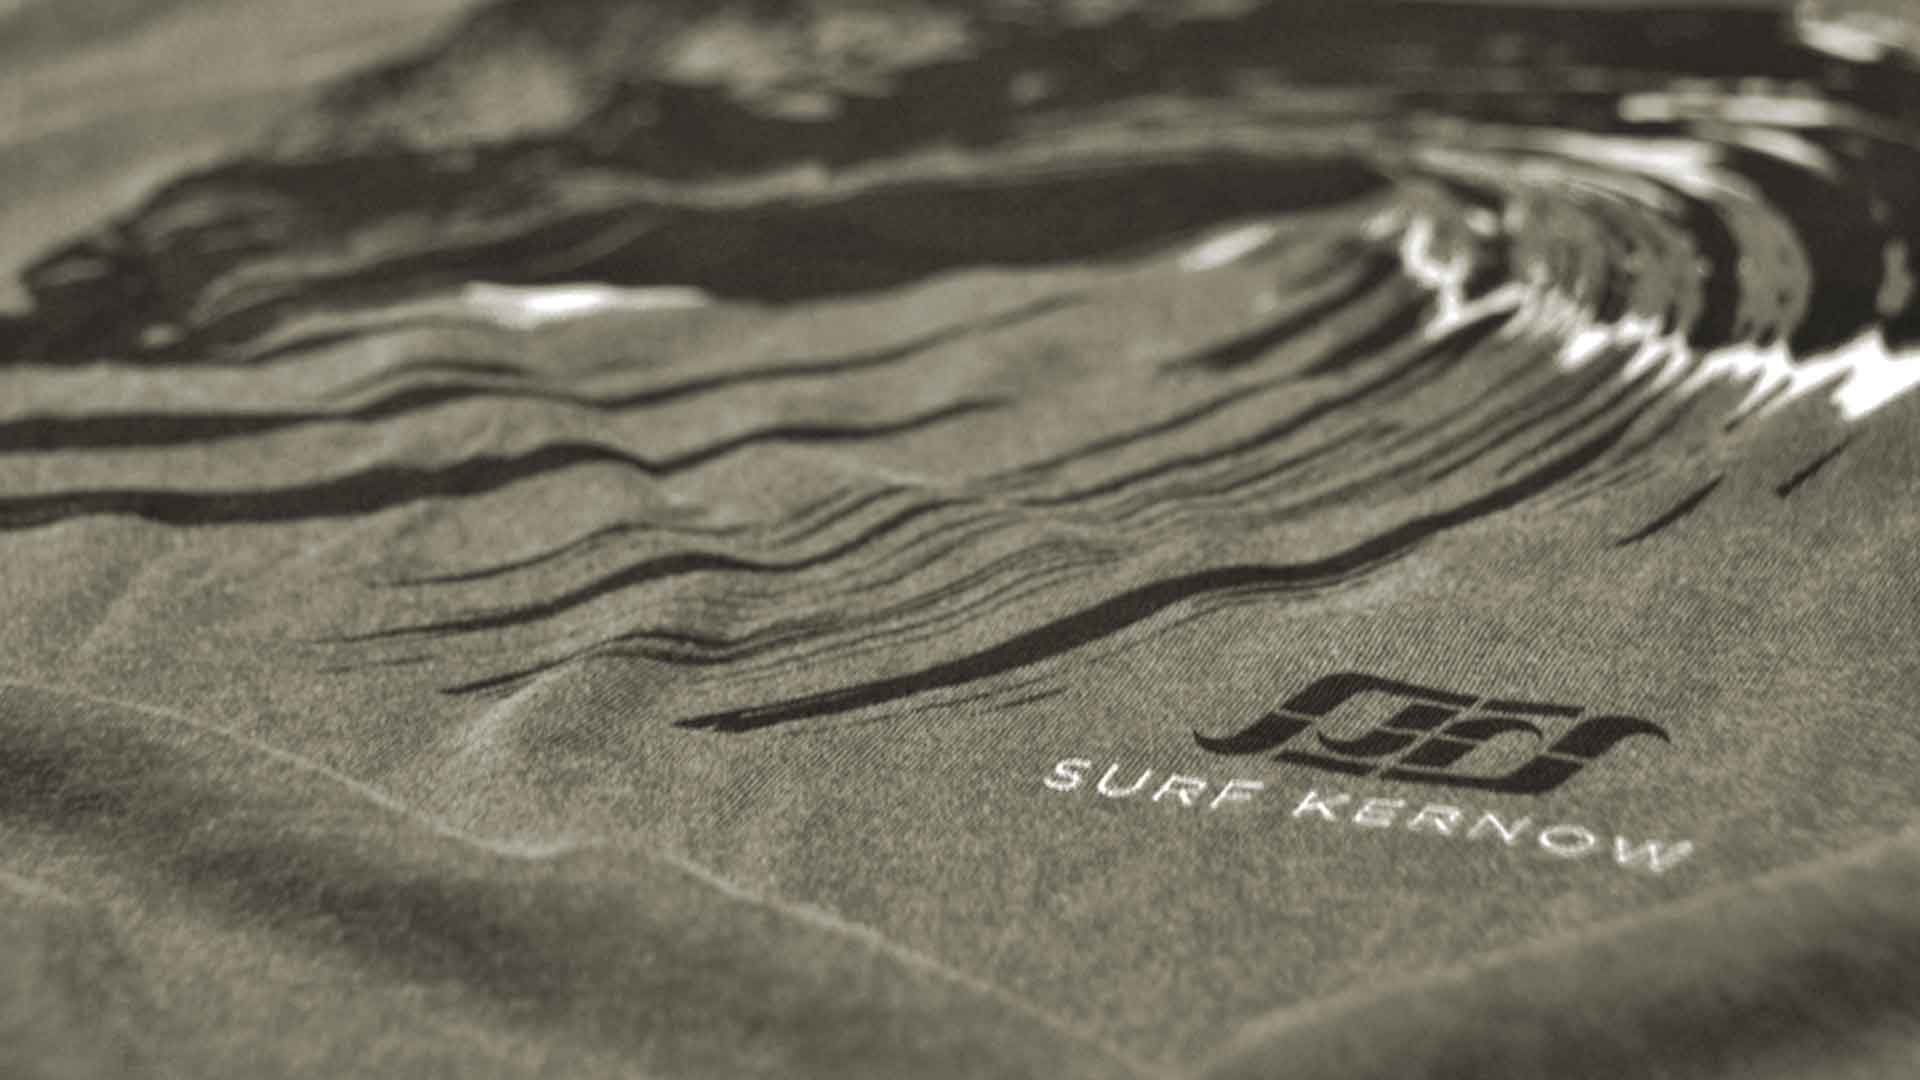 Contact us – Close up of organic cotton t-shirt featuring SURF KERNOW logo.